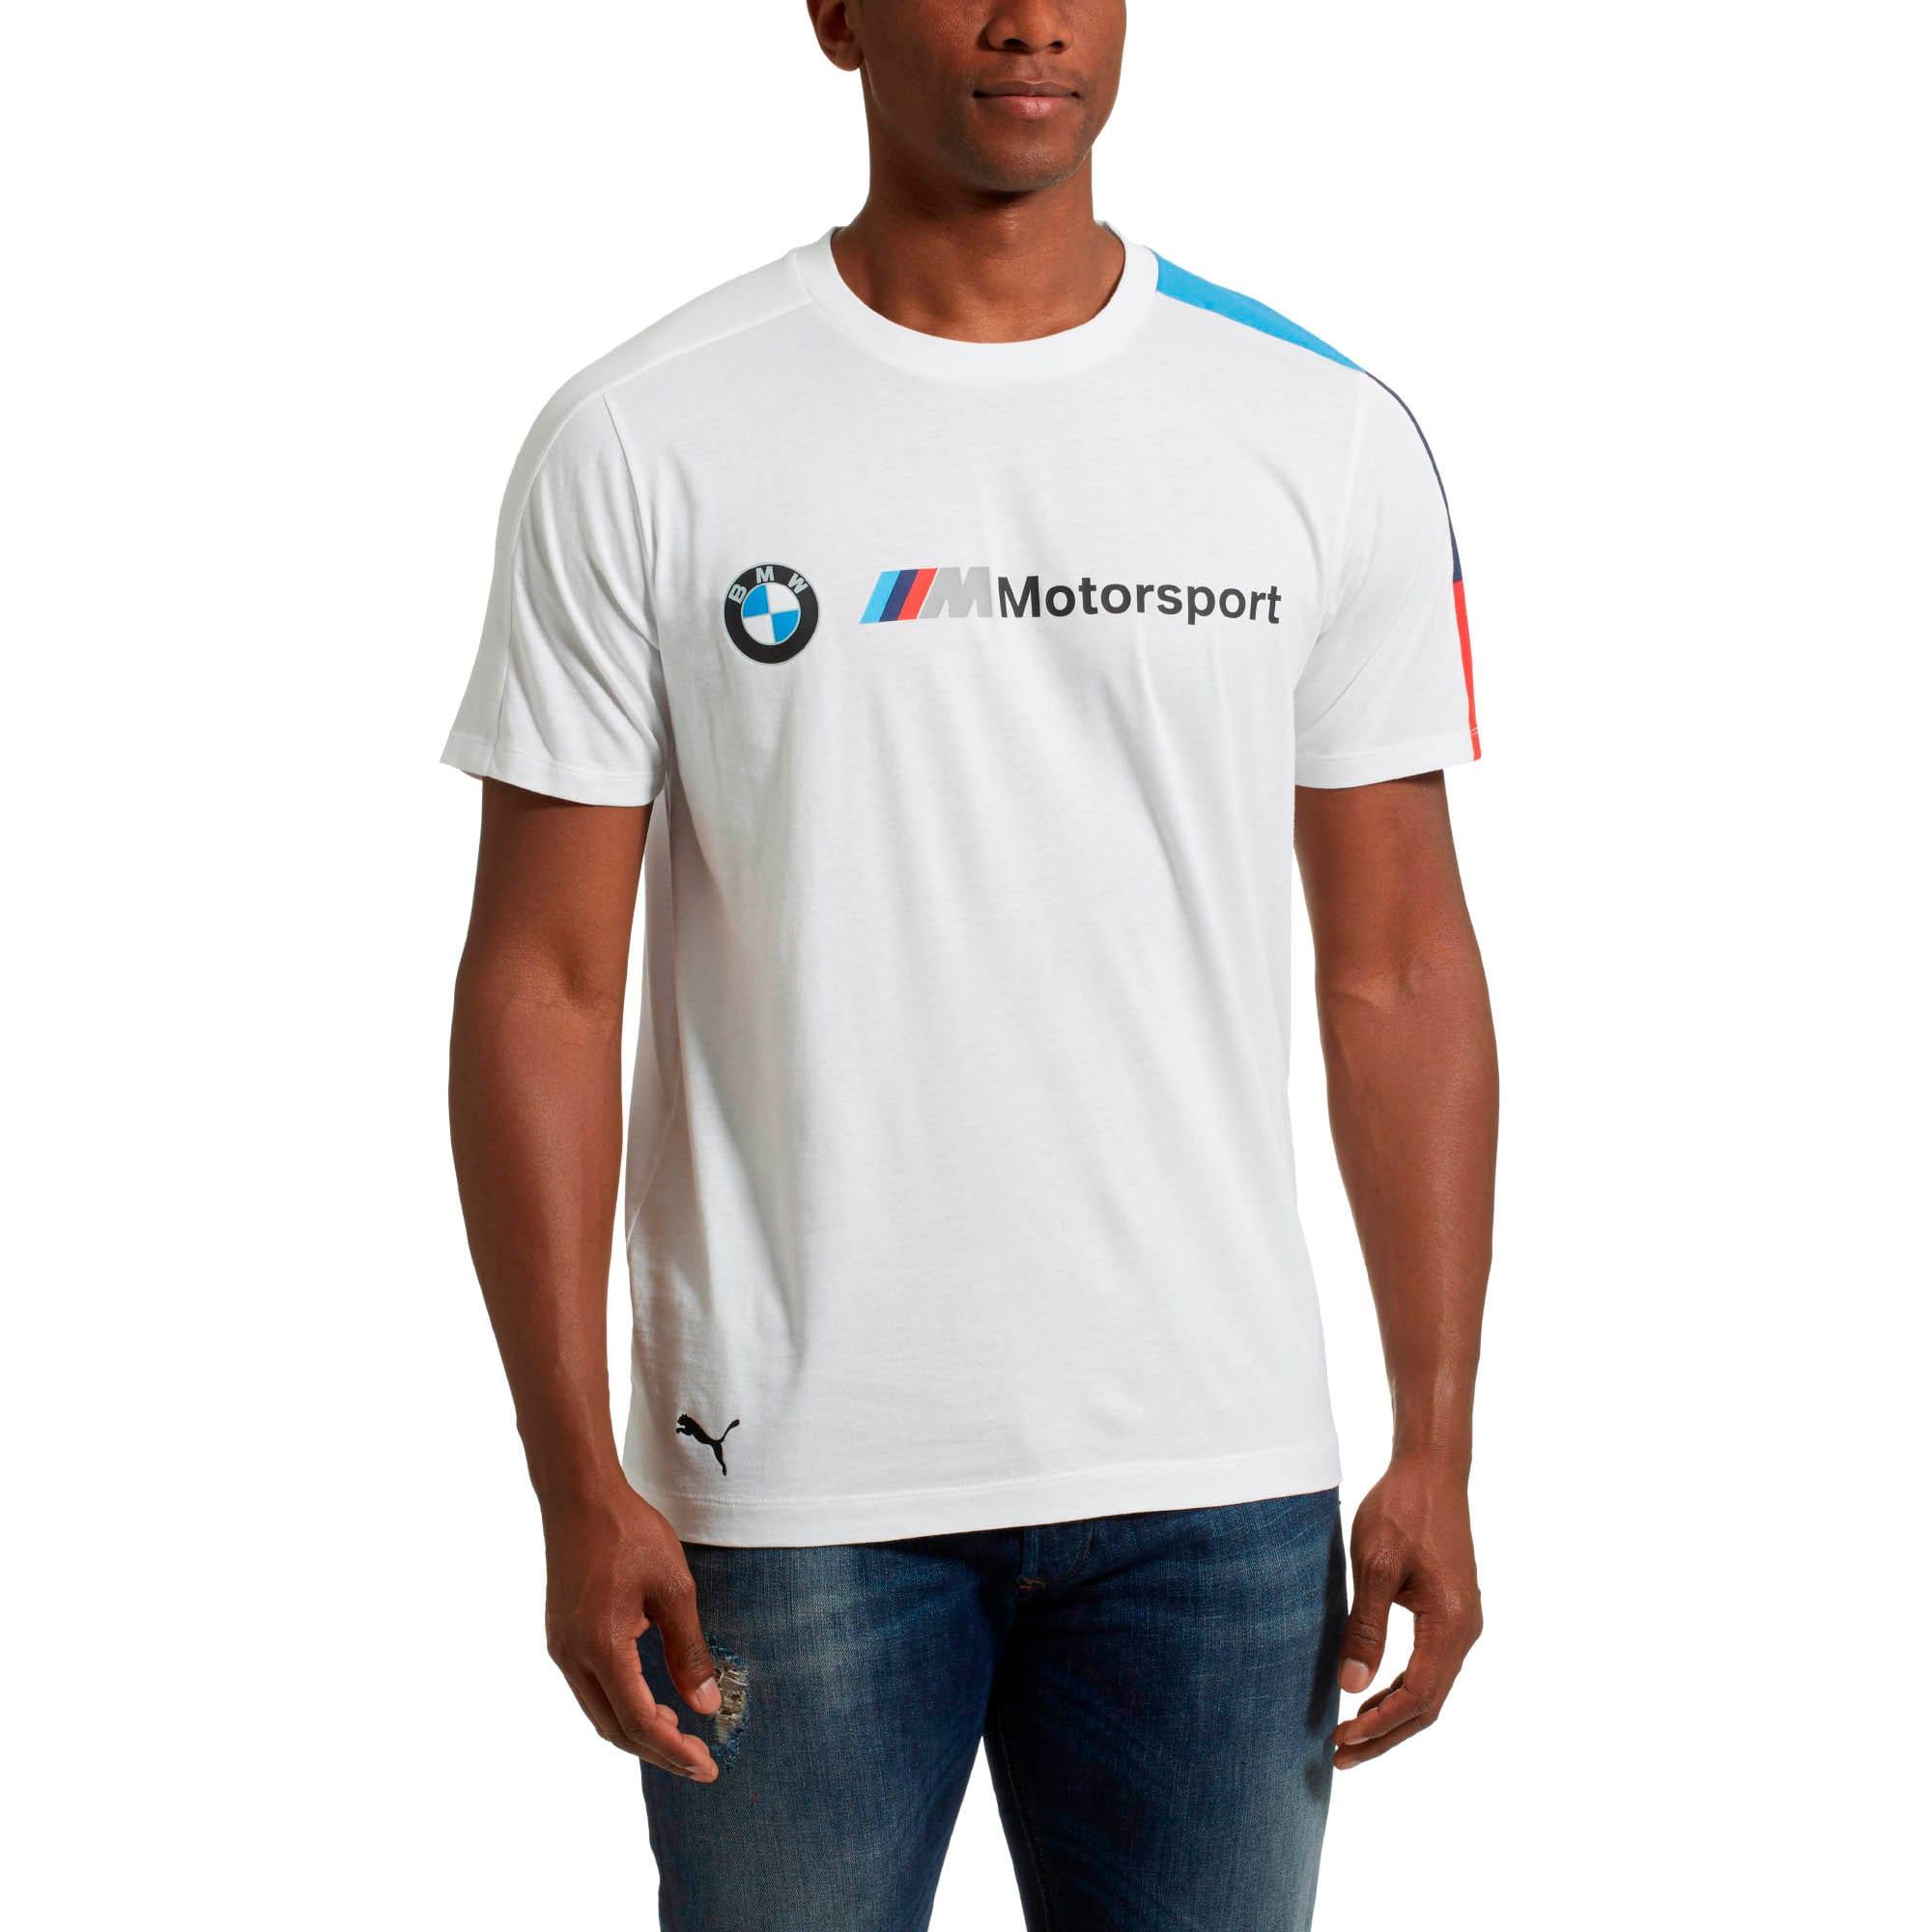 Thumbnail 2 of BMW M Motorsport Men's T7 Tee, Puma White, medium